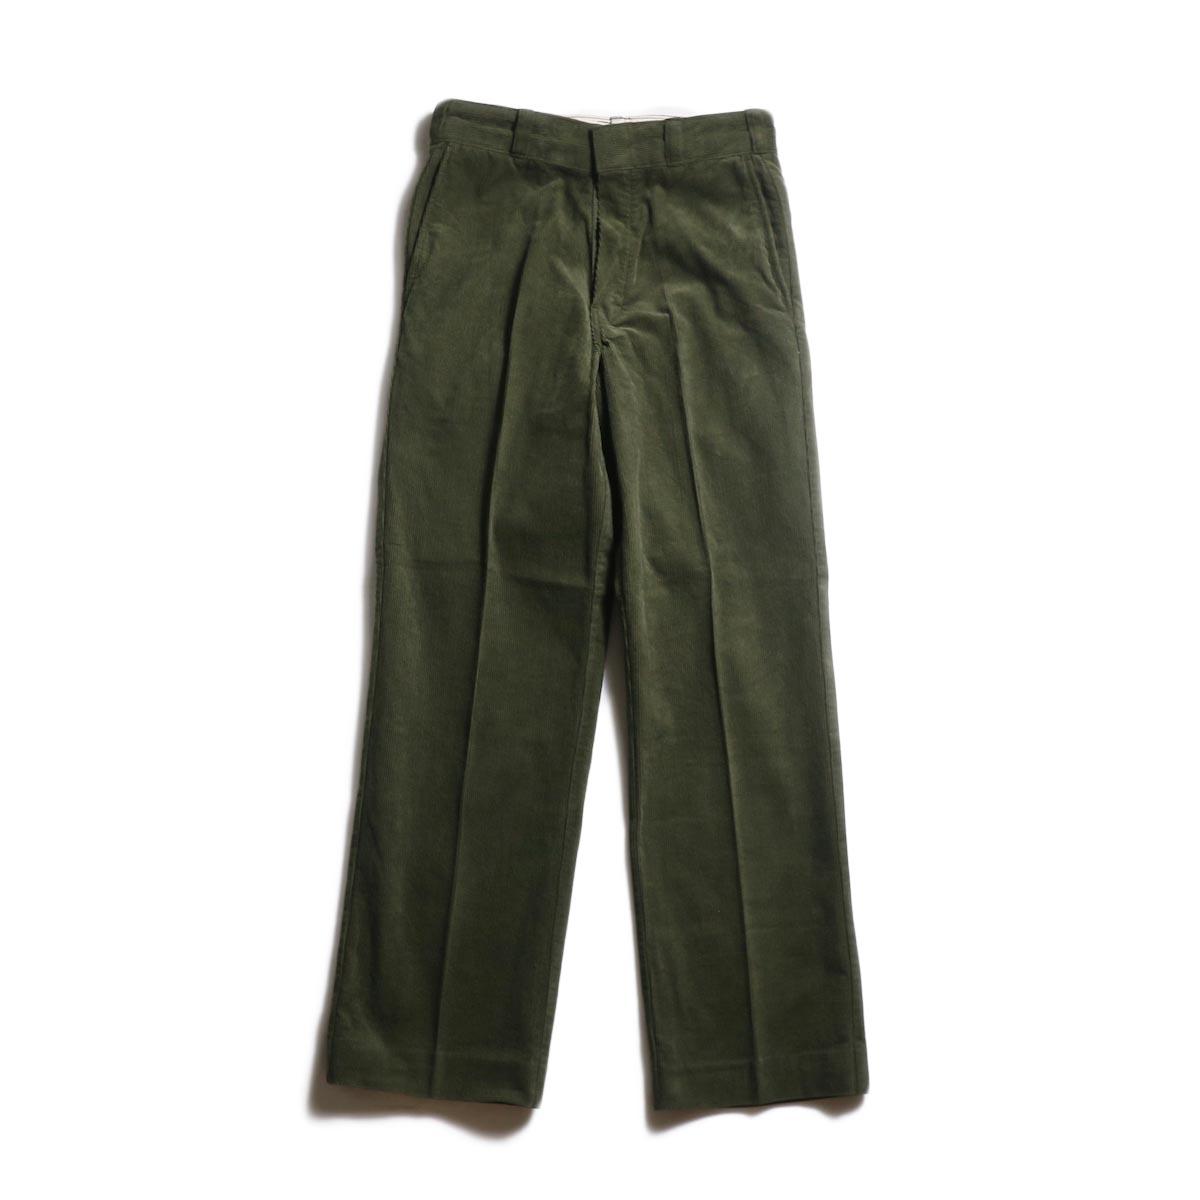 UNUSED × Dickies / UW0774 corduroy pant -Olive